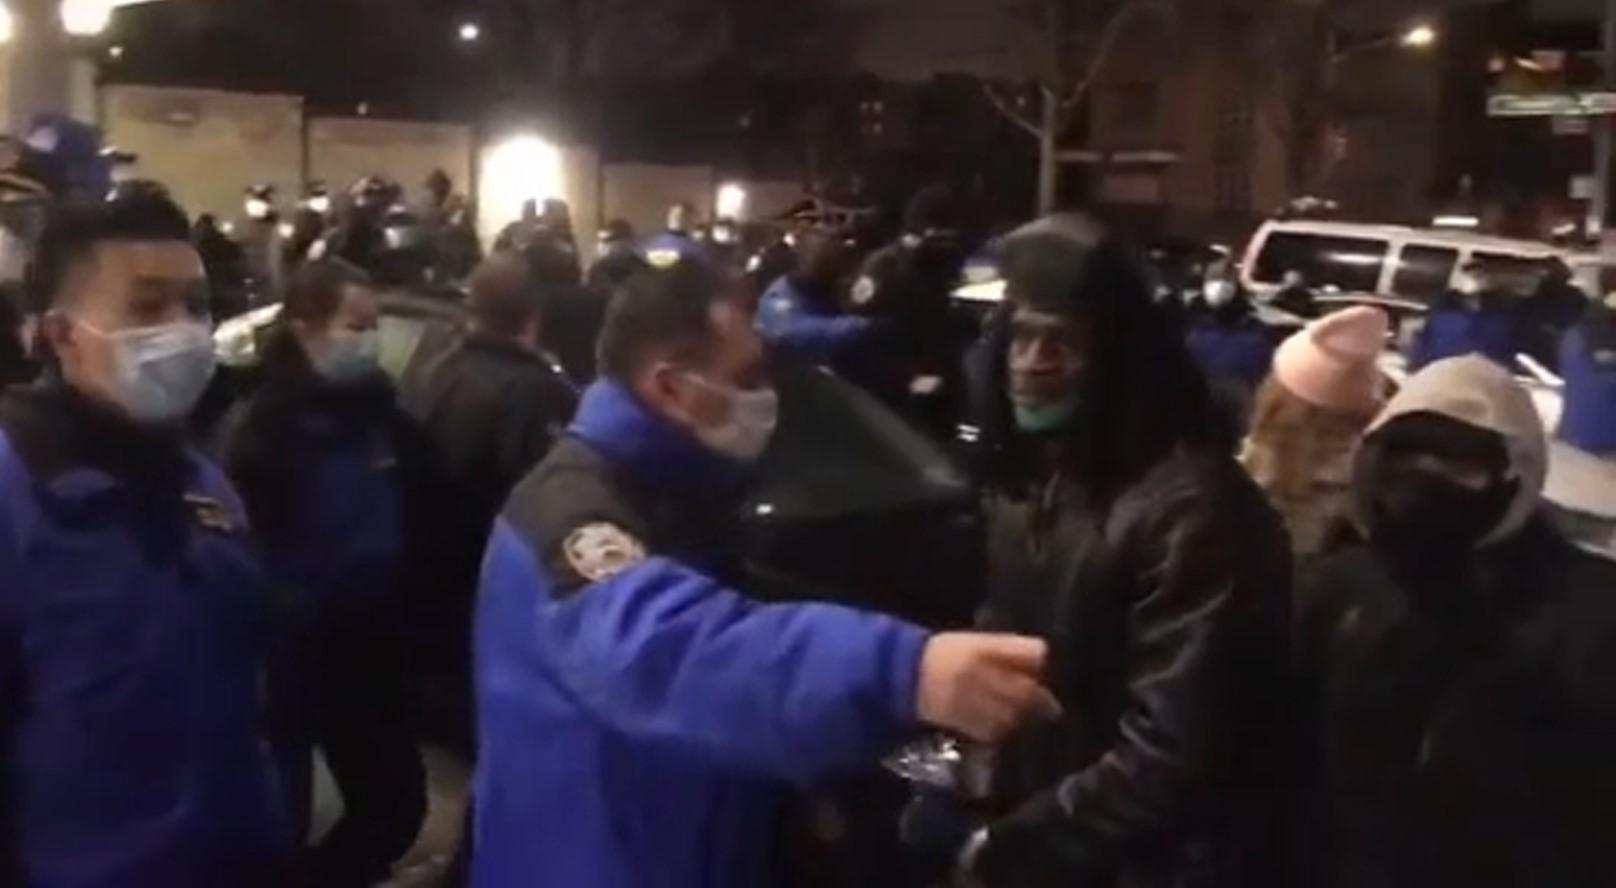 71st Precinct Attacks New York Protesters Demanding Police Accountability